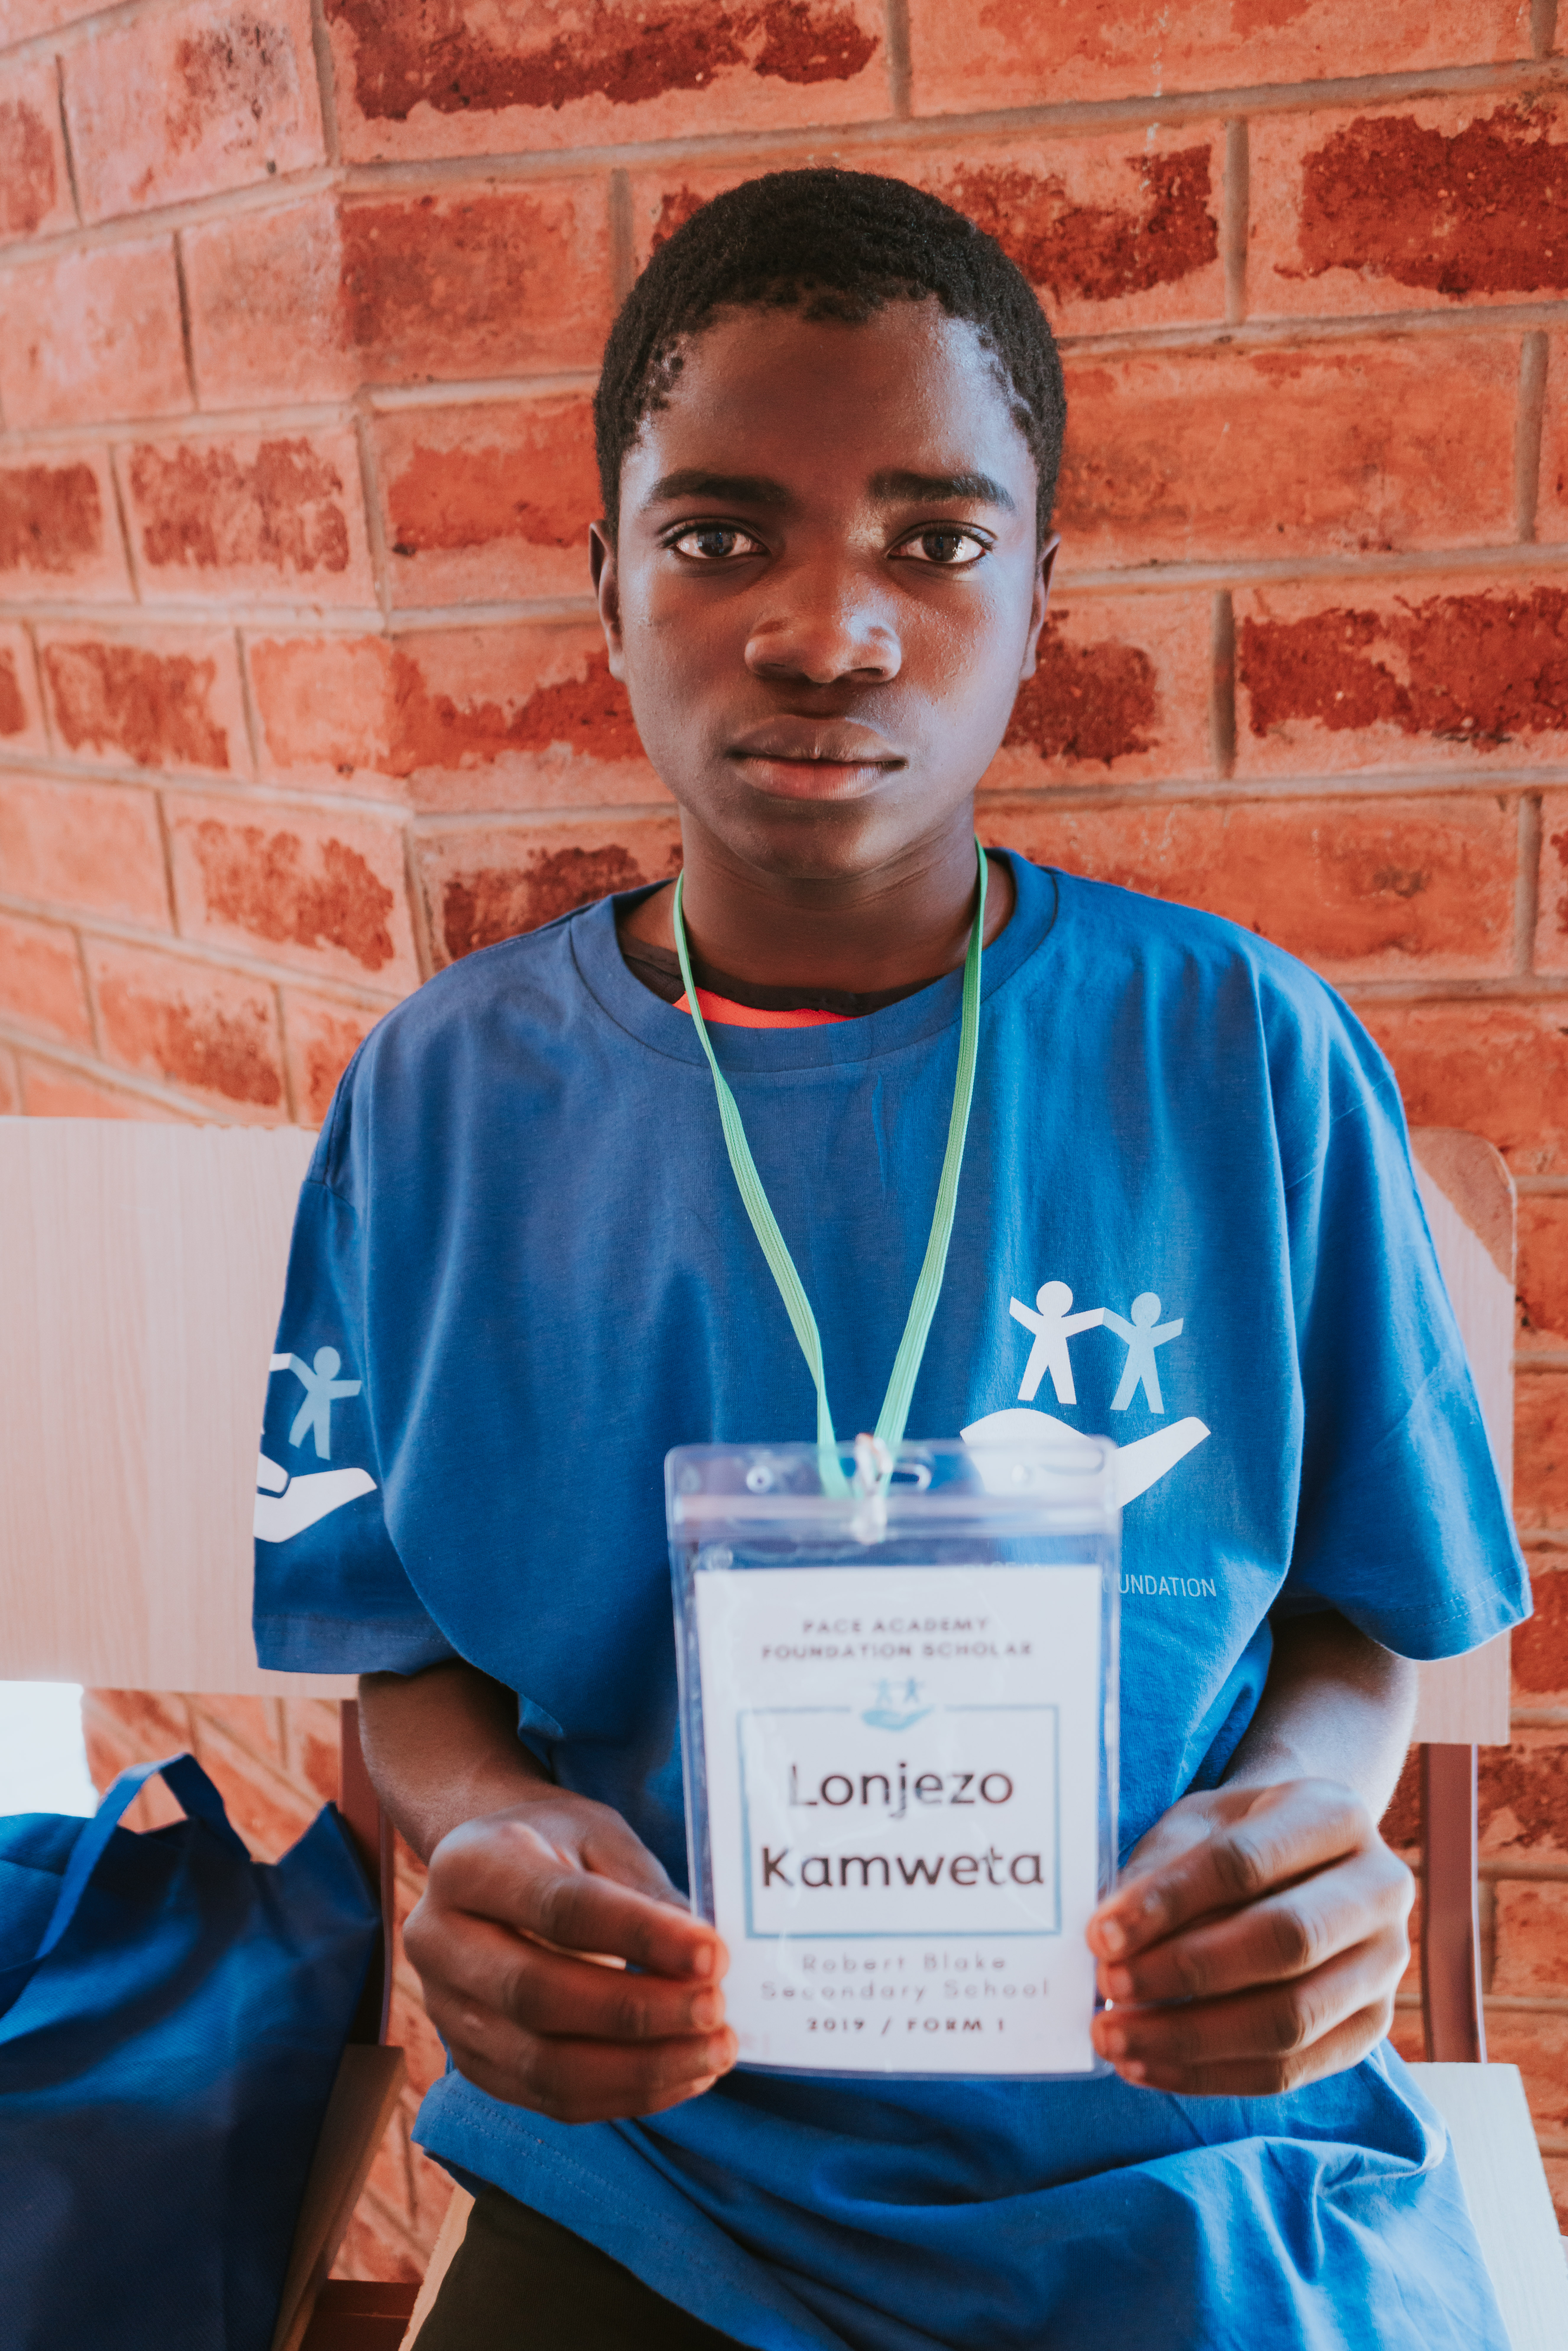 Lonjezo Kamweta (Robert Blake Secondary